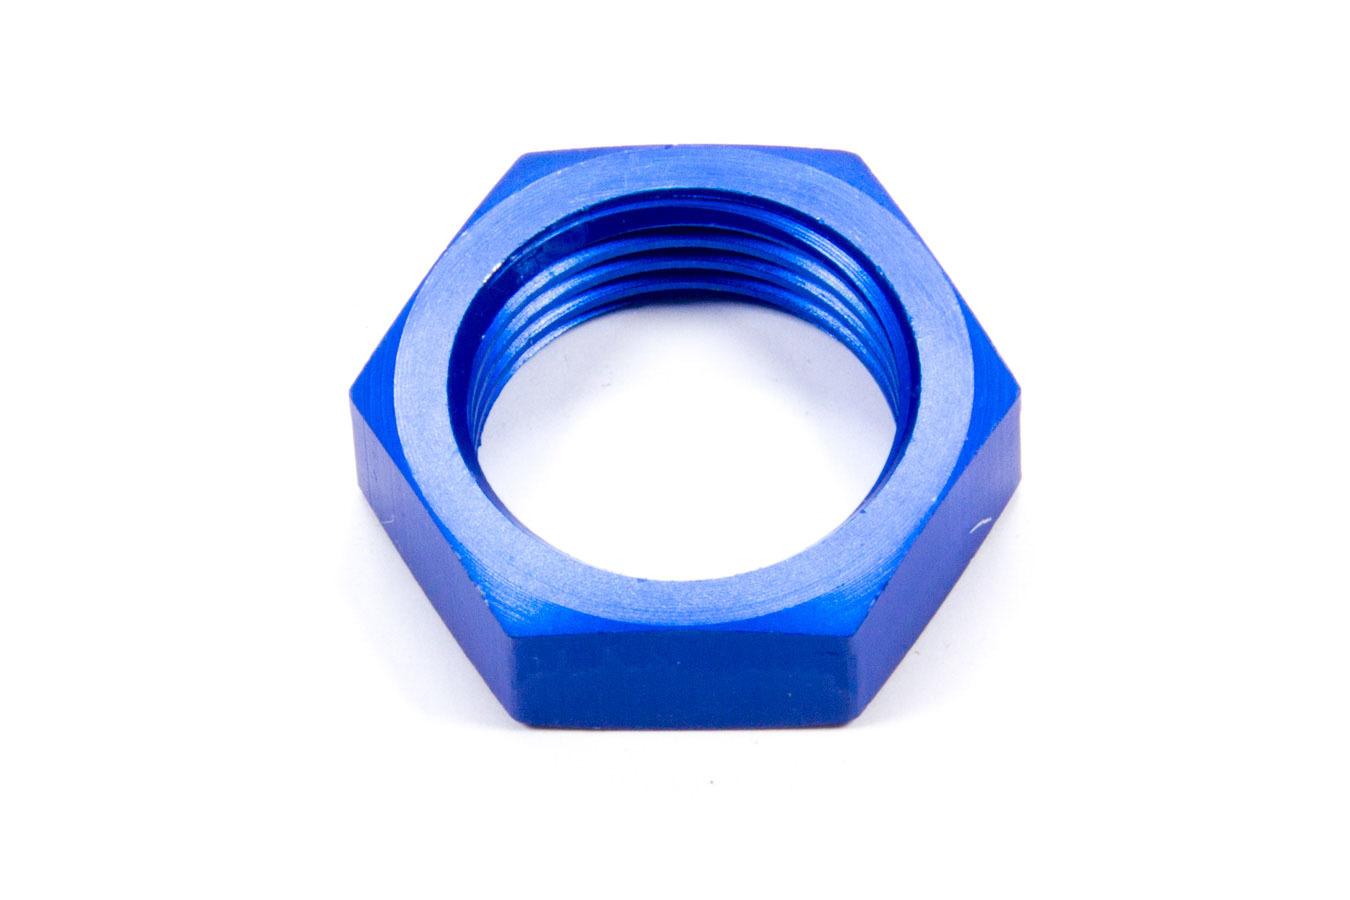 Aeroquip FCM2104 Bulkhead Fitting Nut, 10 AN, Aluminum, Blue Anodized, Each